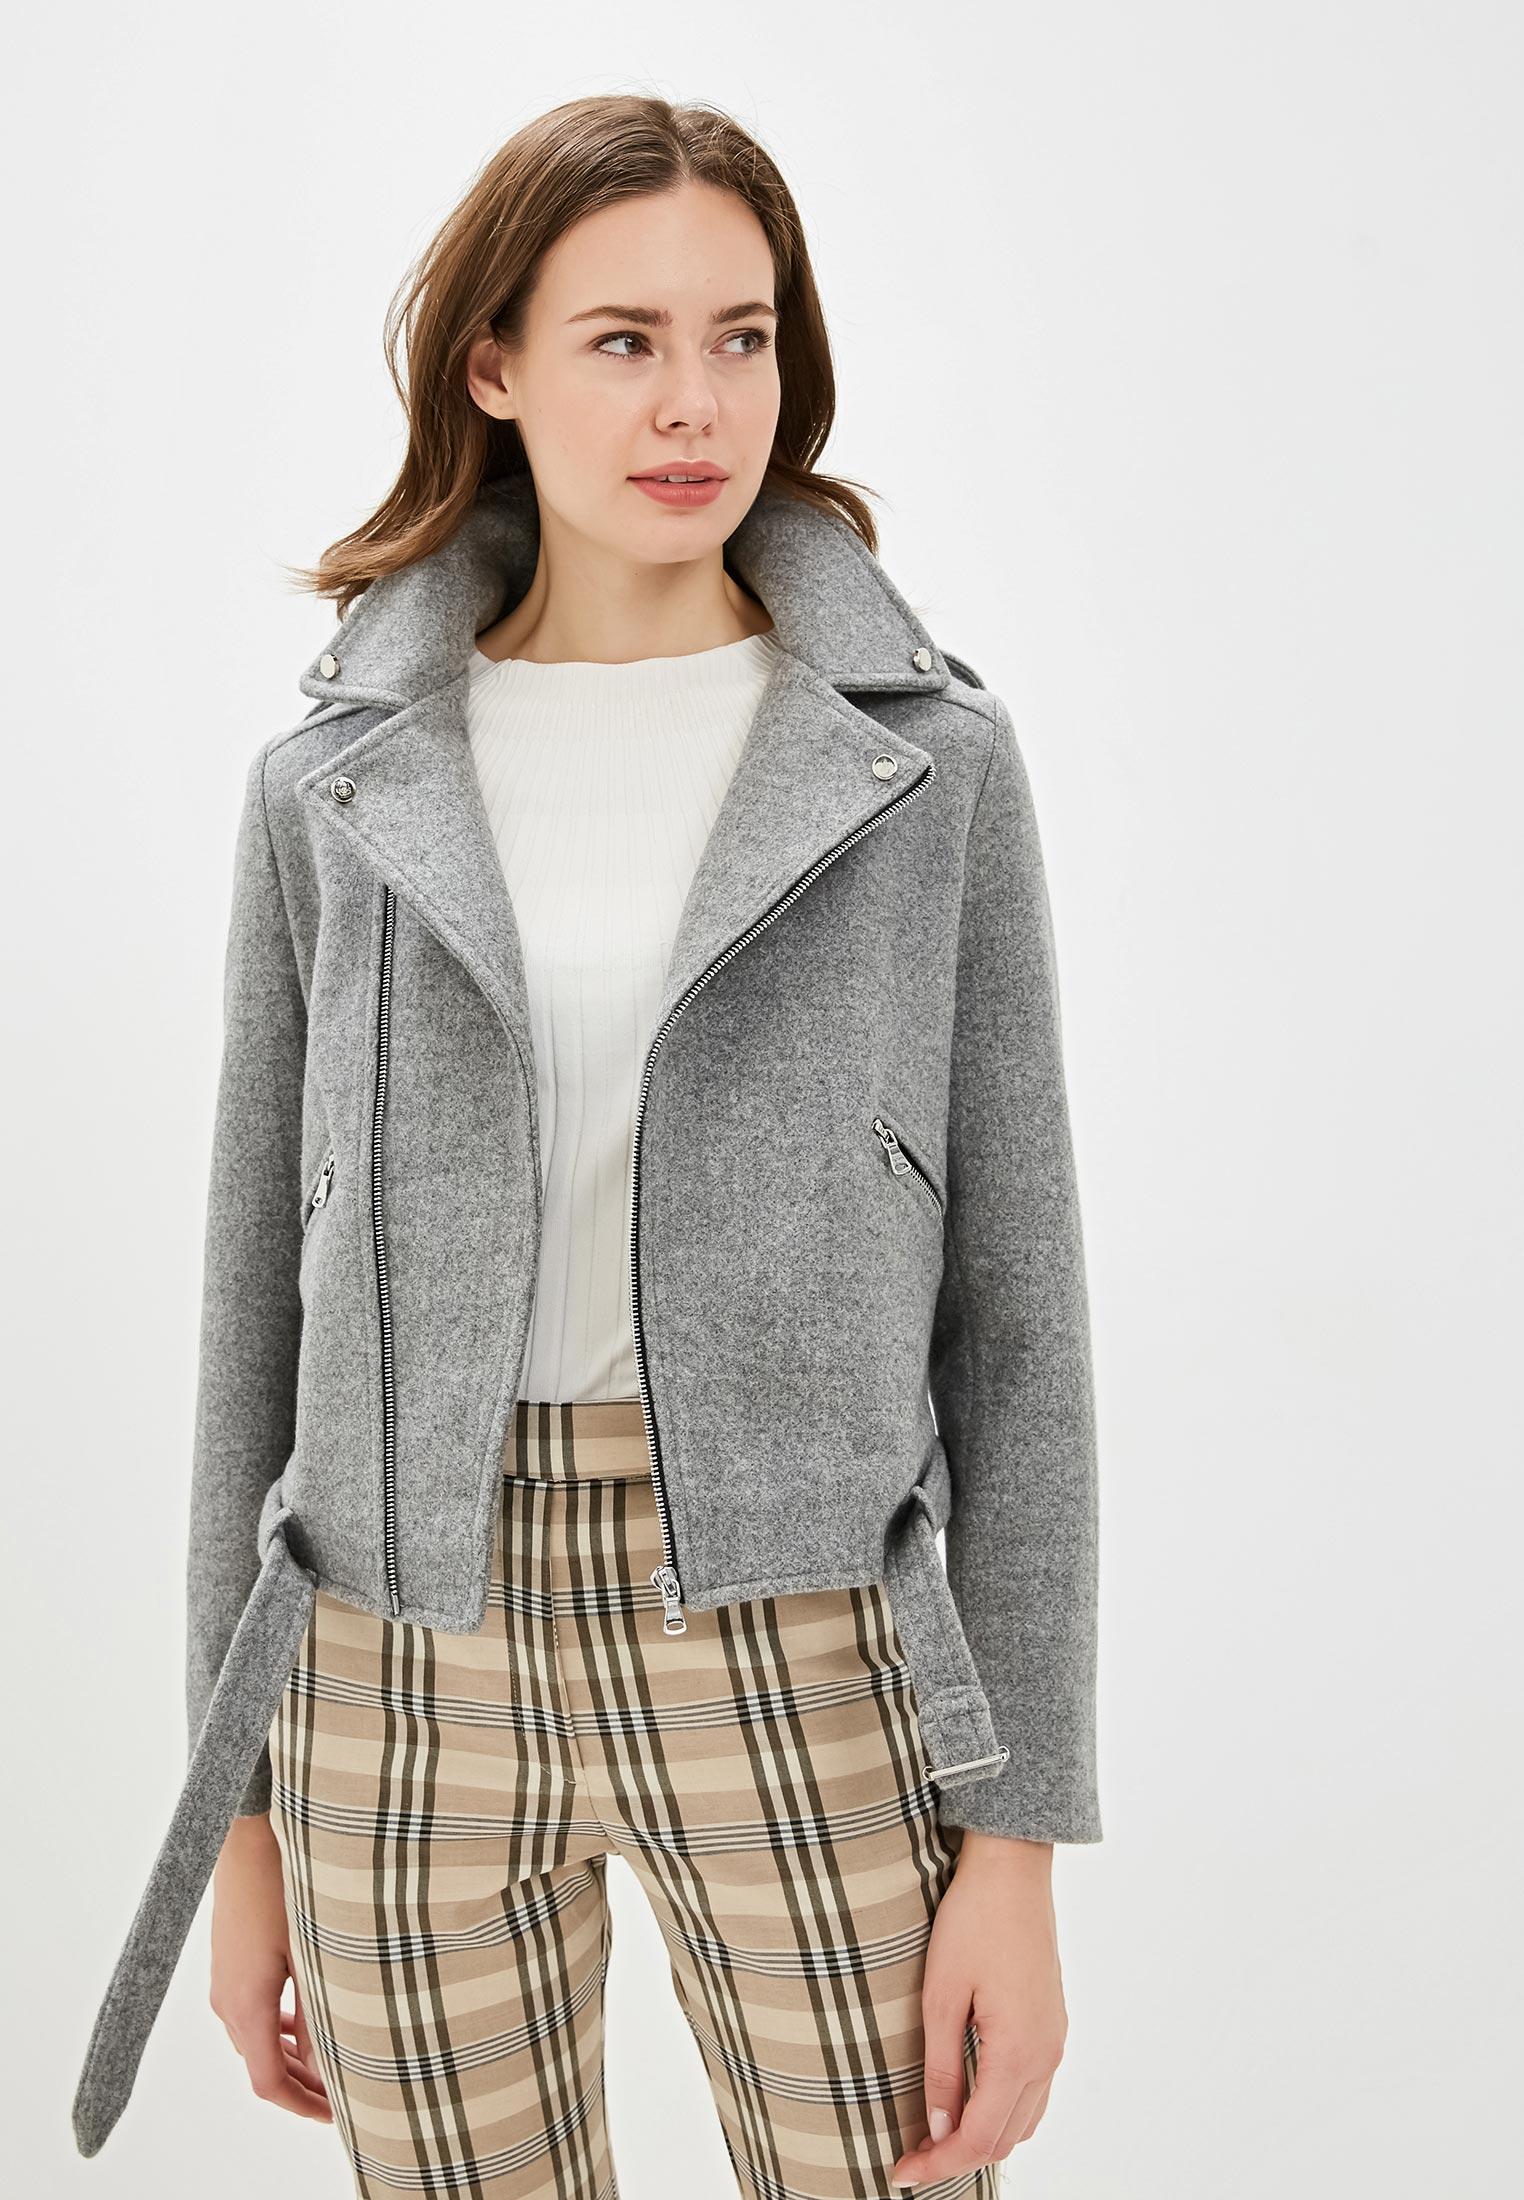 Куртка, Gold Chic Chili, цвет: серый. Артикул: MP002XW0IB4M. Одежда / Верхняя одежда / Косухи